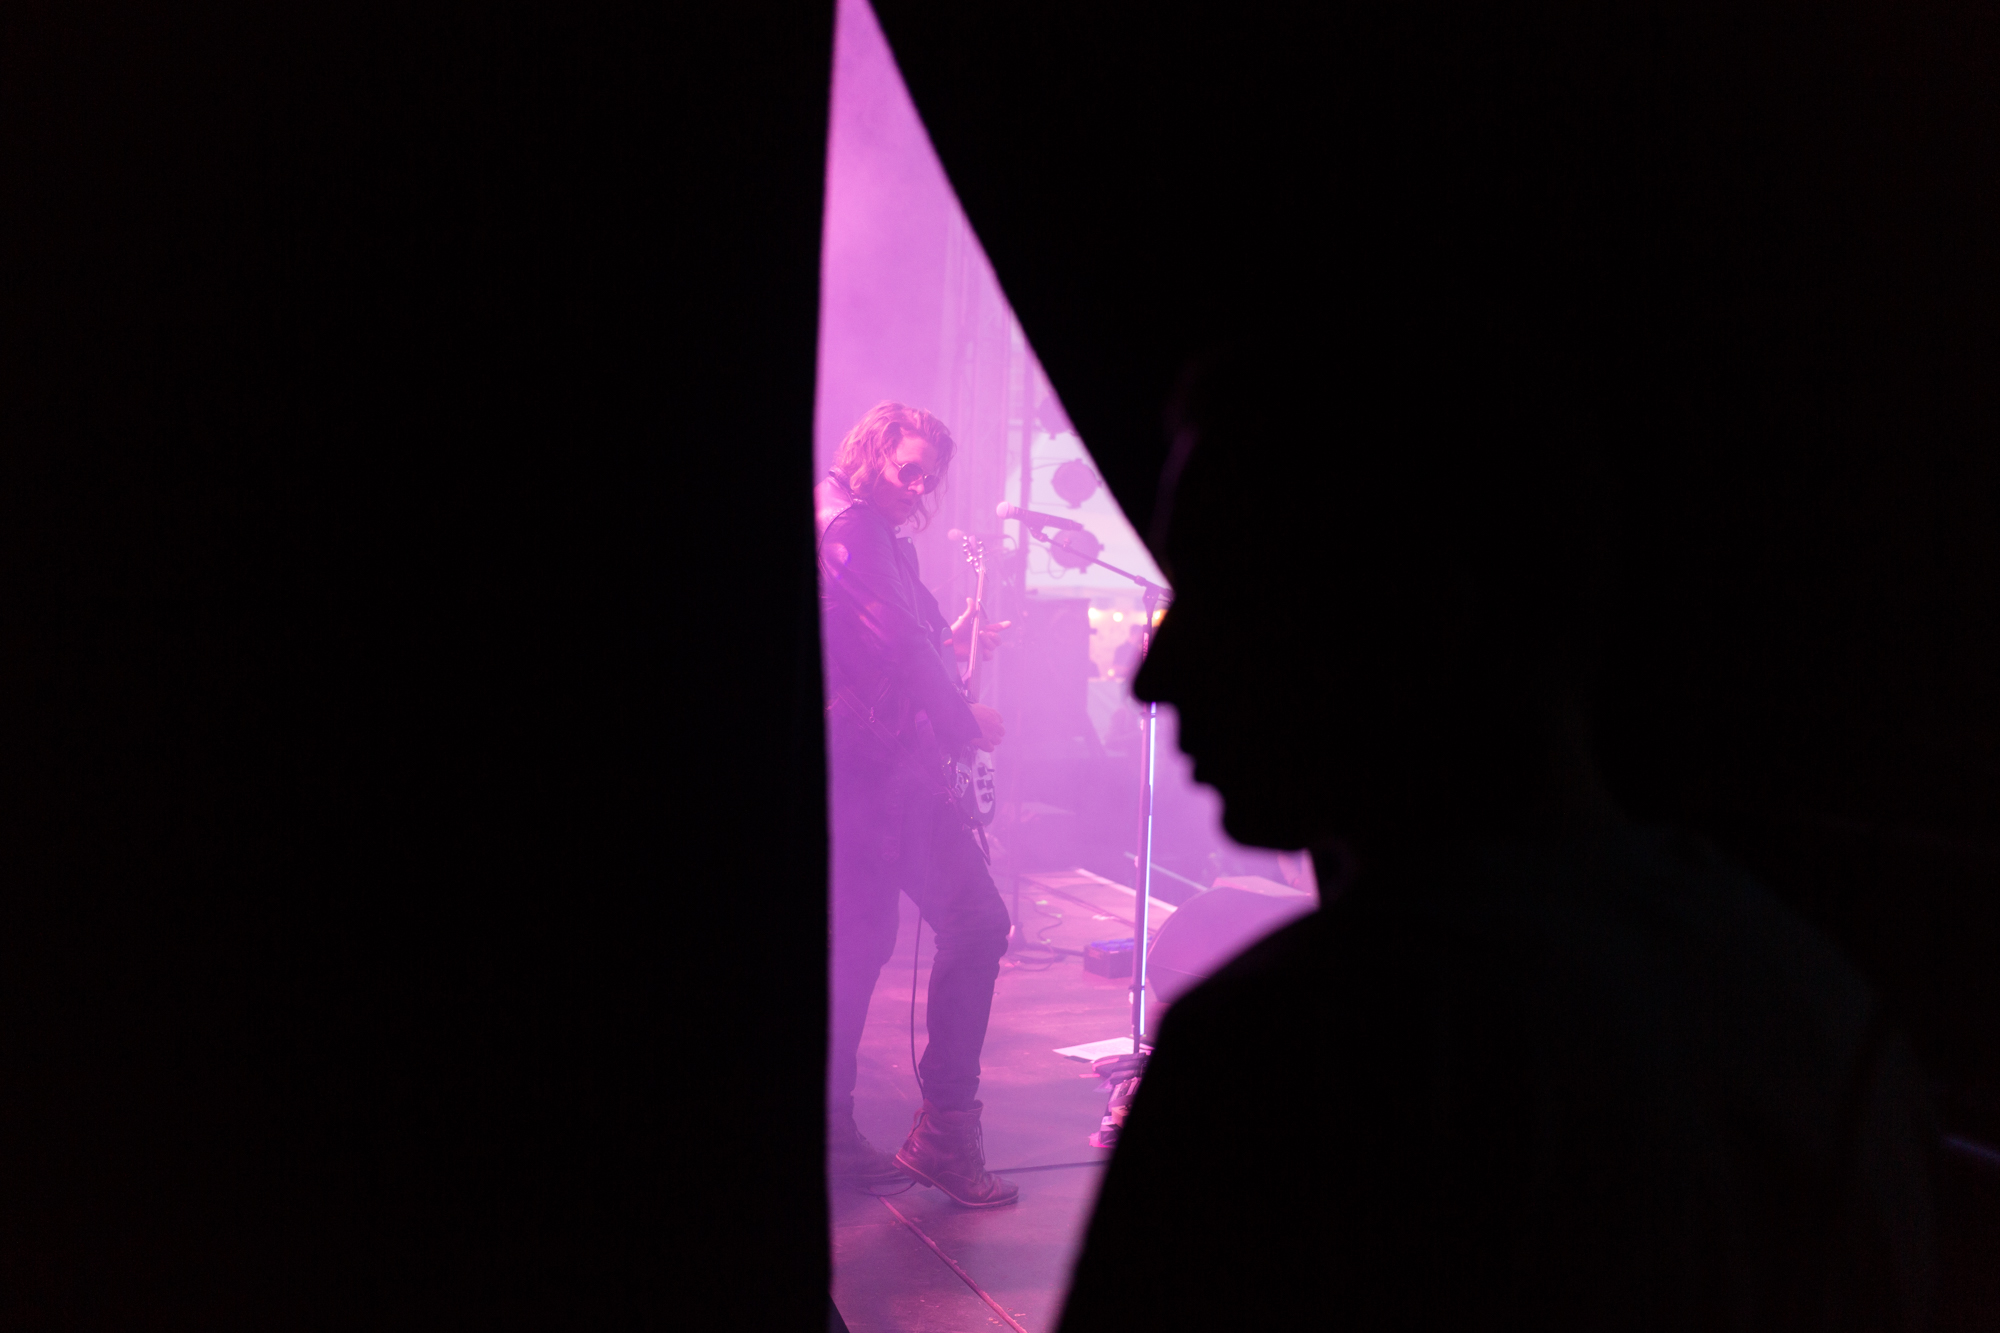 rover-les-georges-festival-musique-fribourg-pierre-yves-massot-photographe.jpg